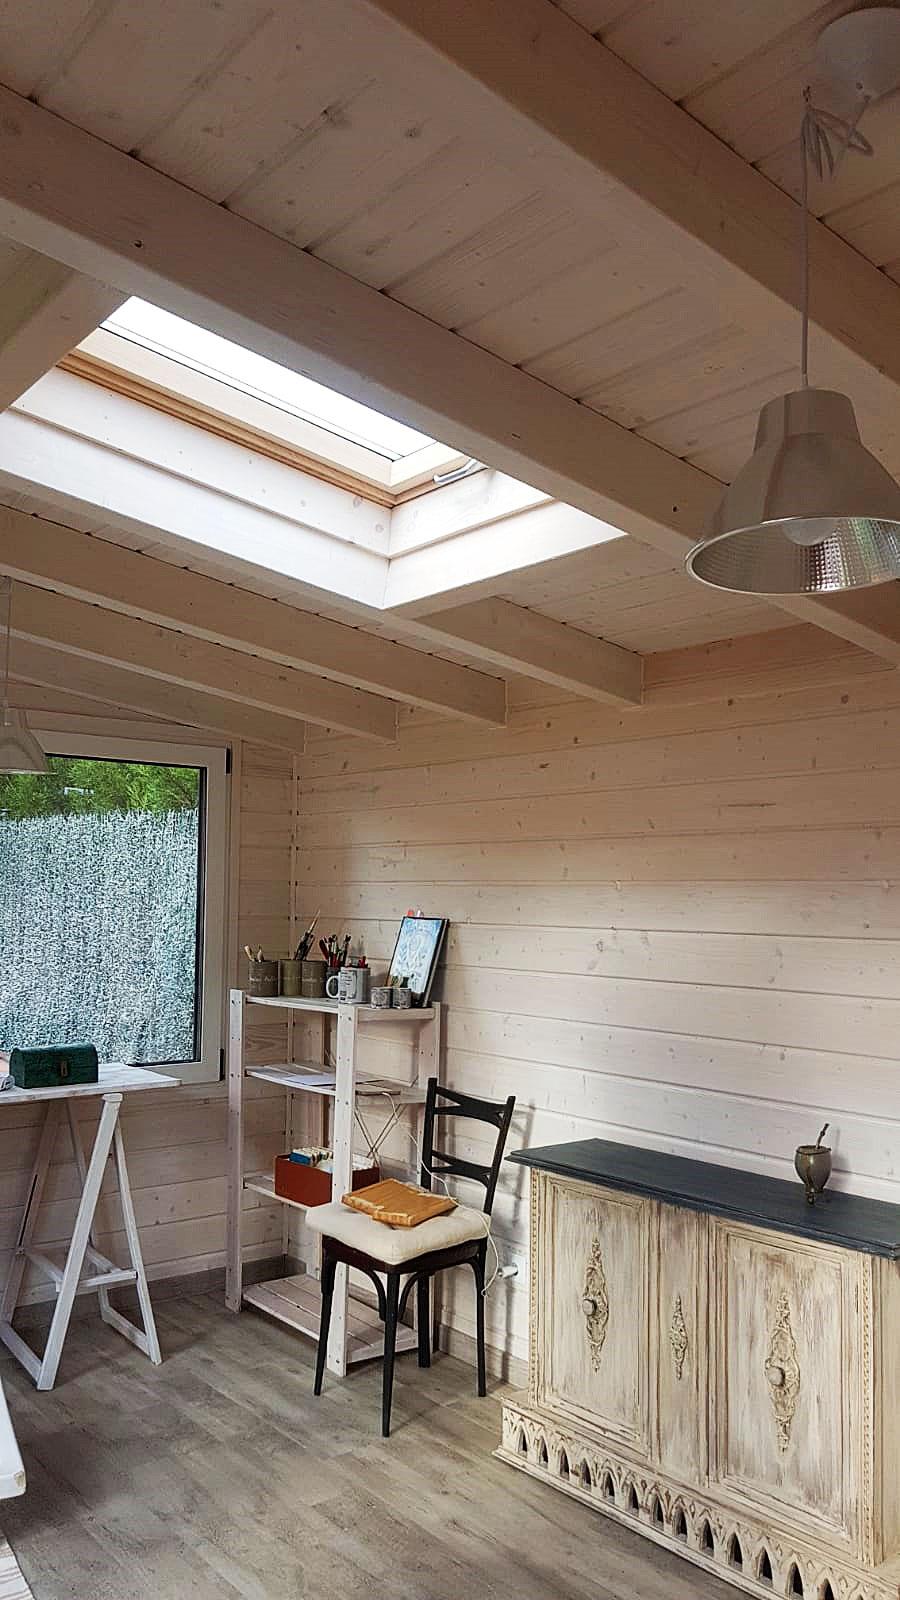 Interior caseta madera habitable 14.25m2 Caseta Living